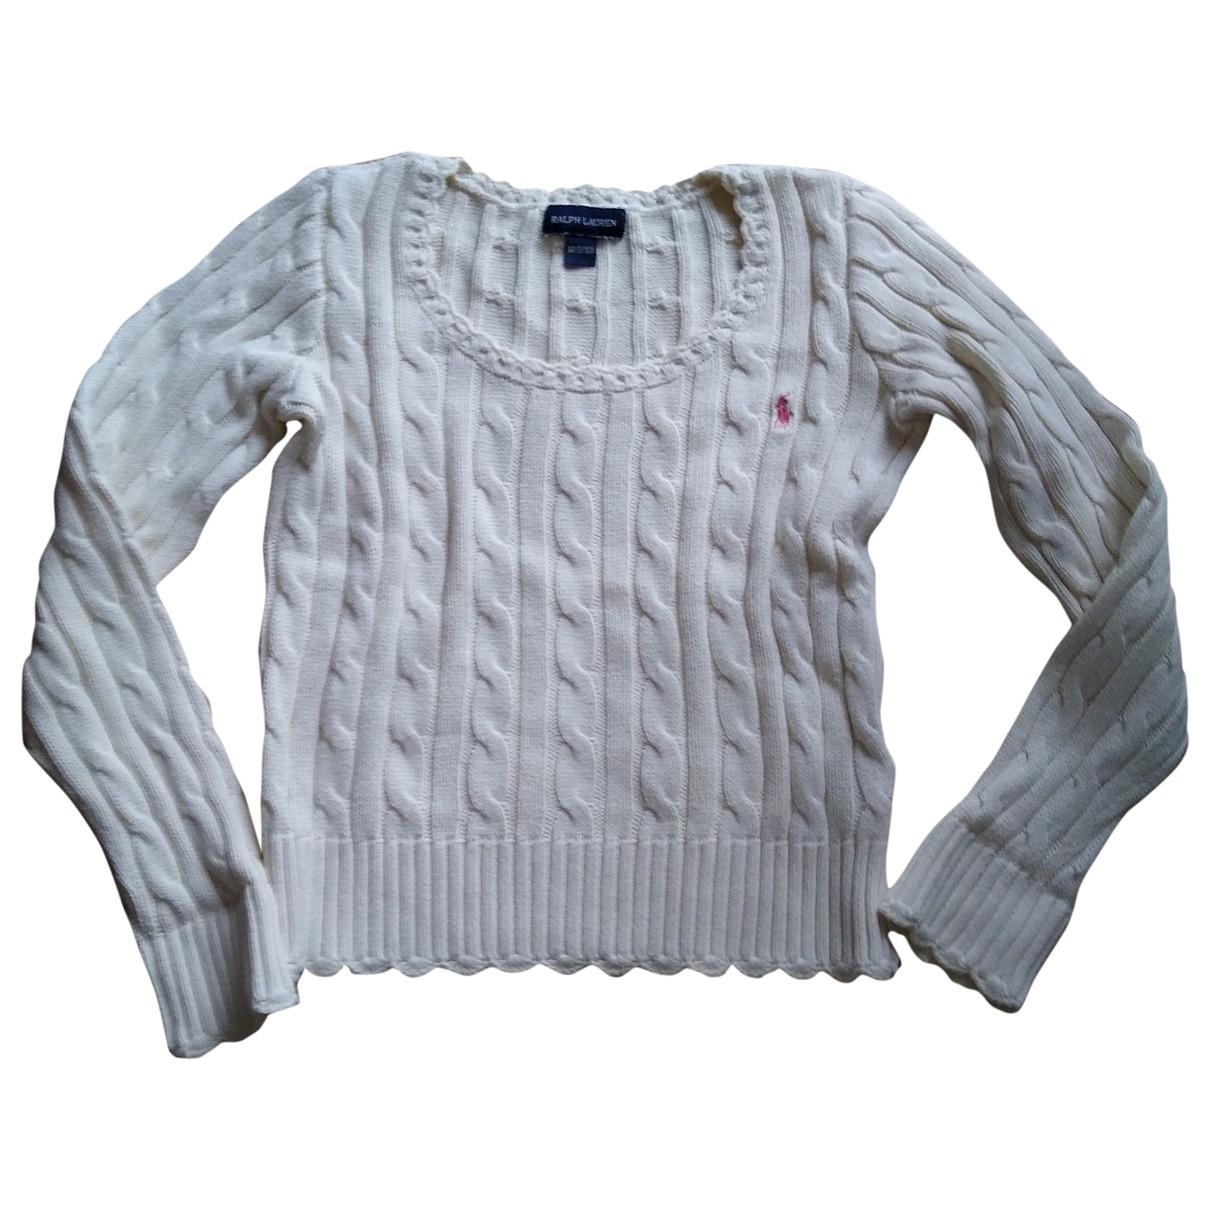 Ralph Lauren \N Beige Cotton Knitwear for Kids 8 years - up to 128cm FR